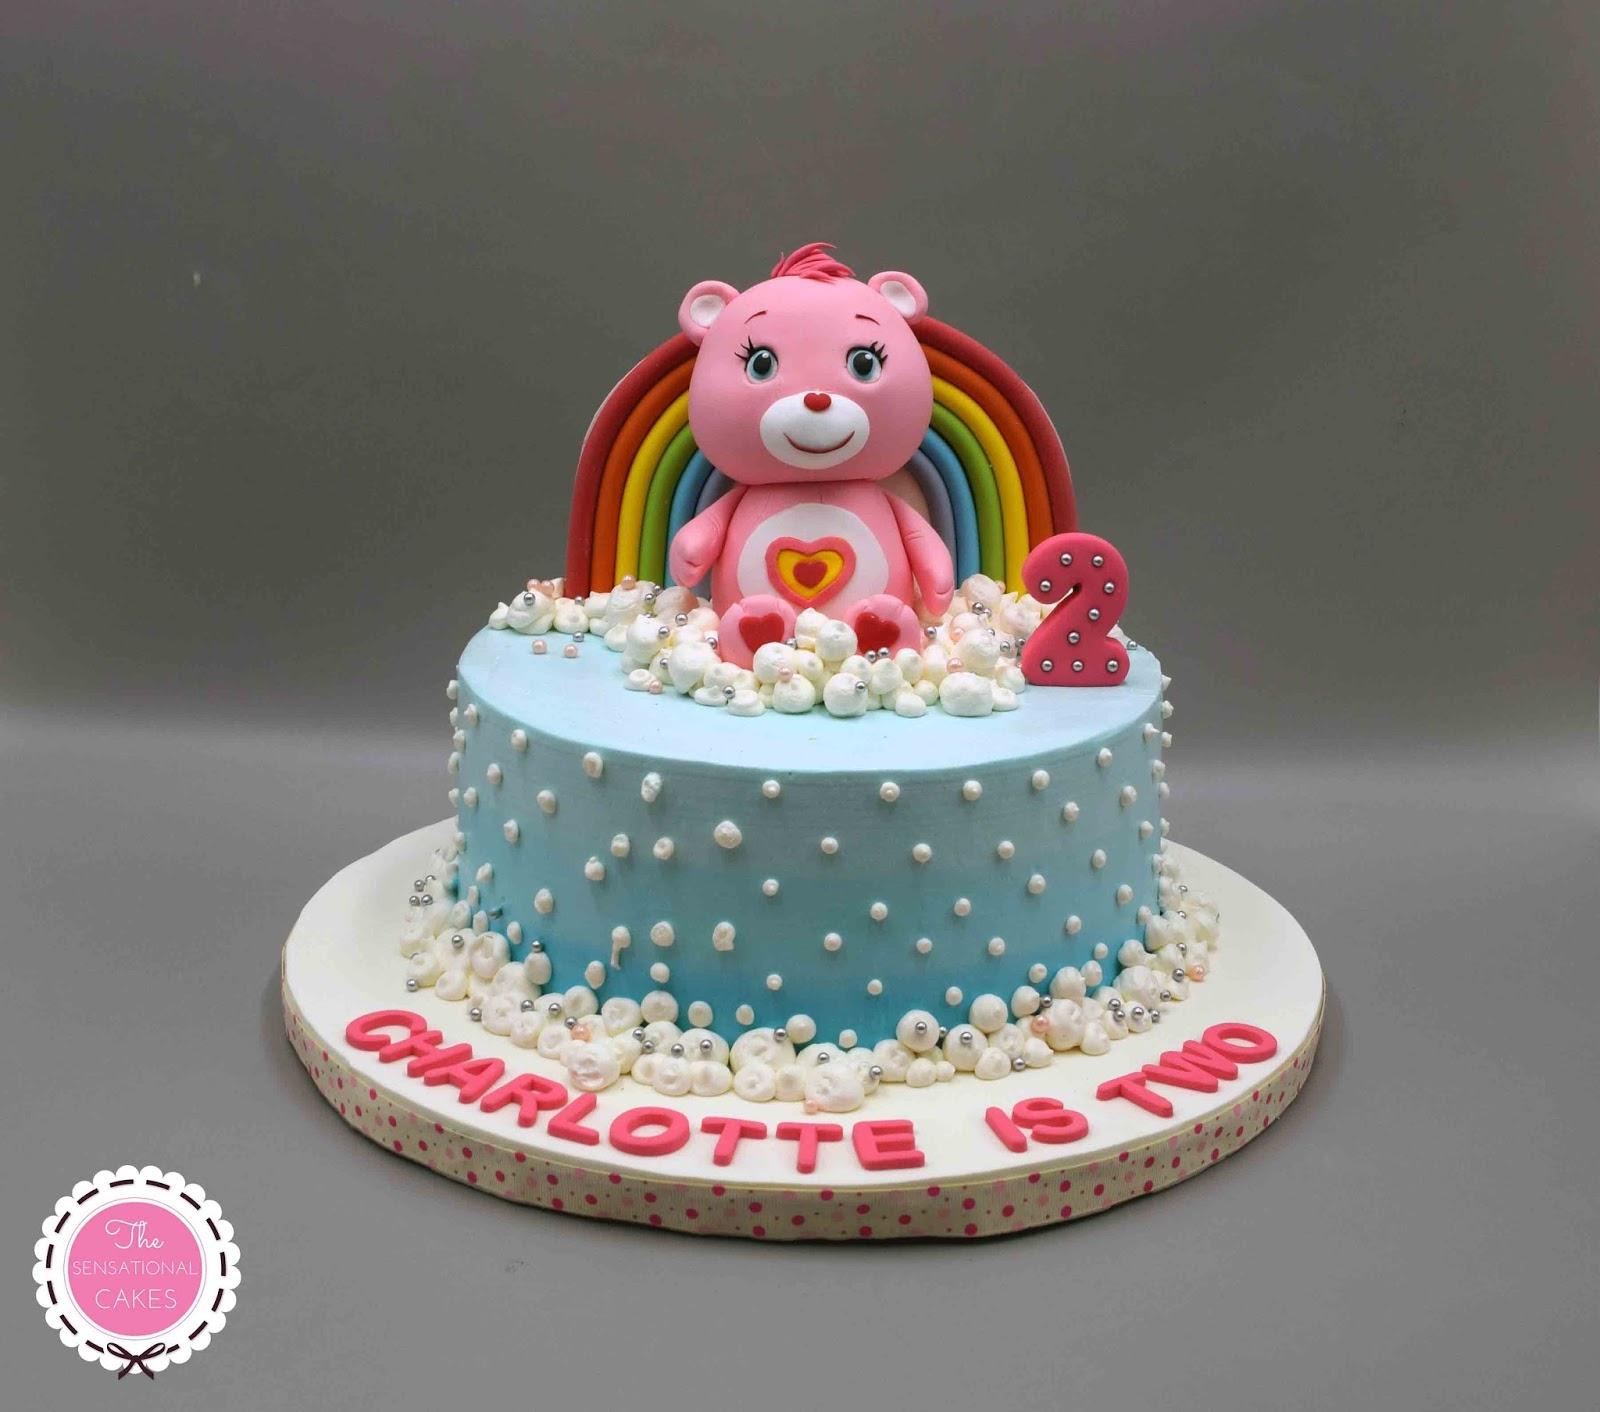 The Sensational Cakes Care Bear Concept 3d Birthday Cake Singapore